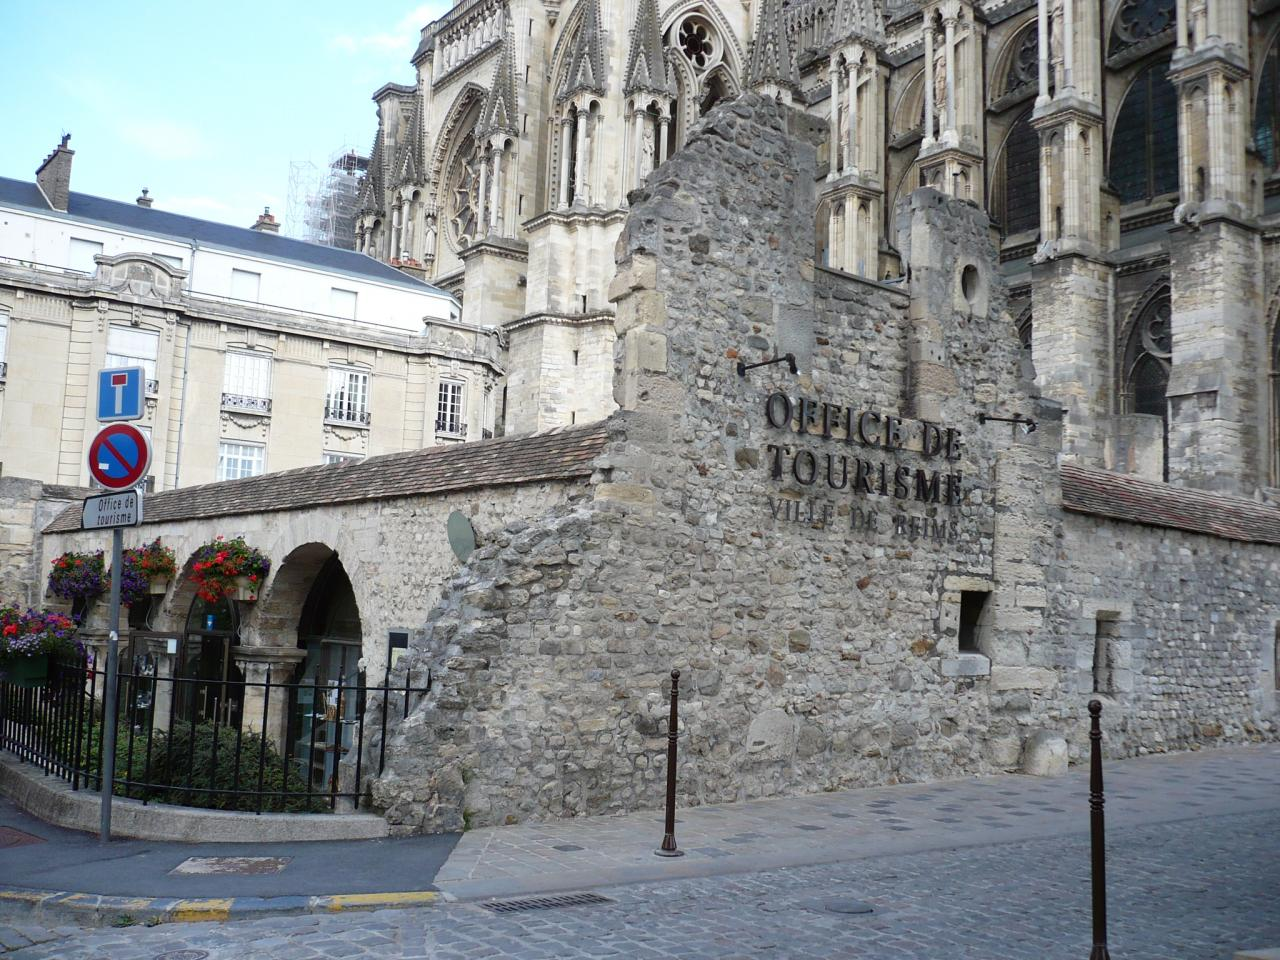 Reims - Office du tourisme toronto ...